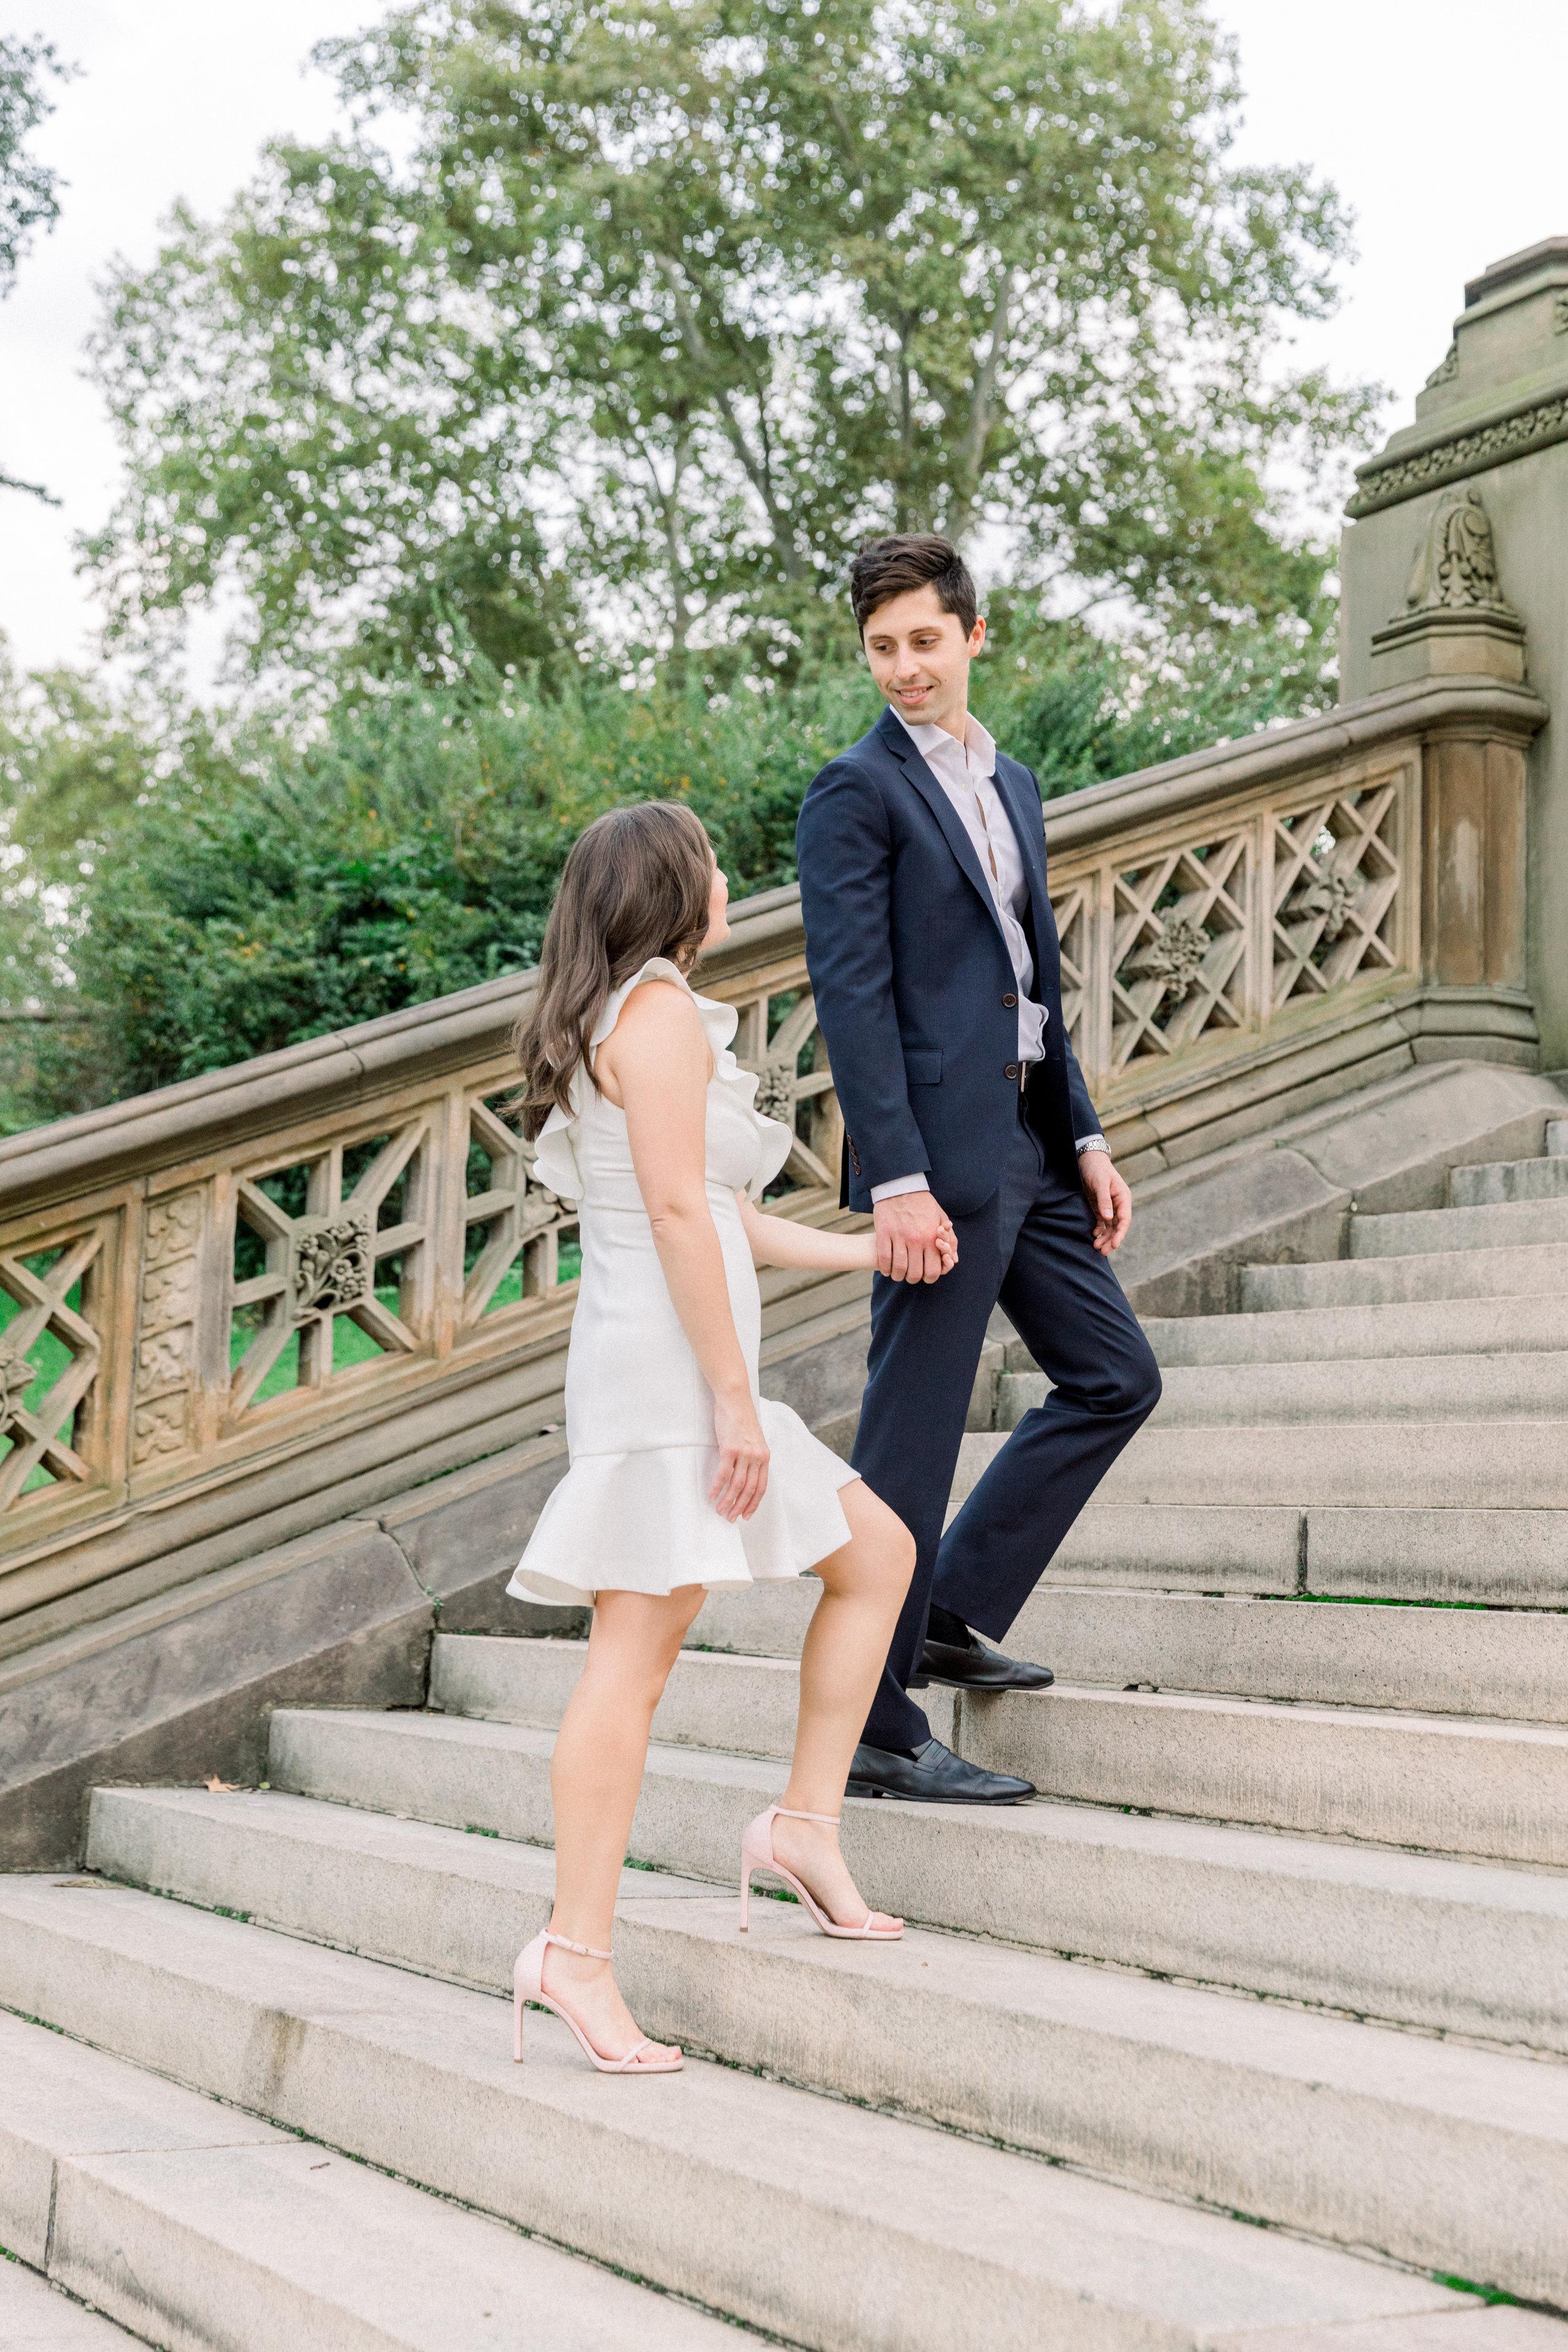 Hudson-Nichols-Central-Park-NYC-Fine-Art-Film-Engagement-Photography-20.jpg